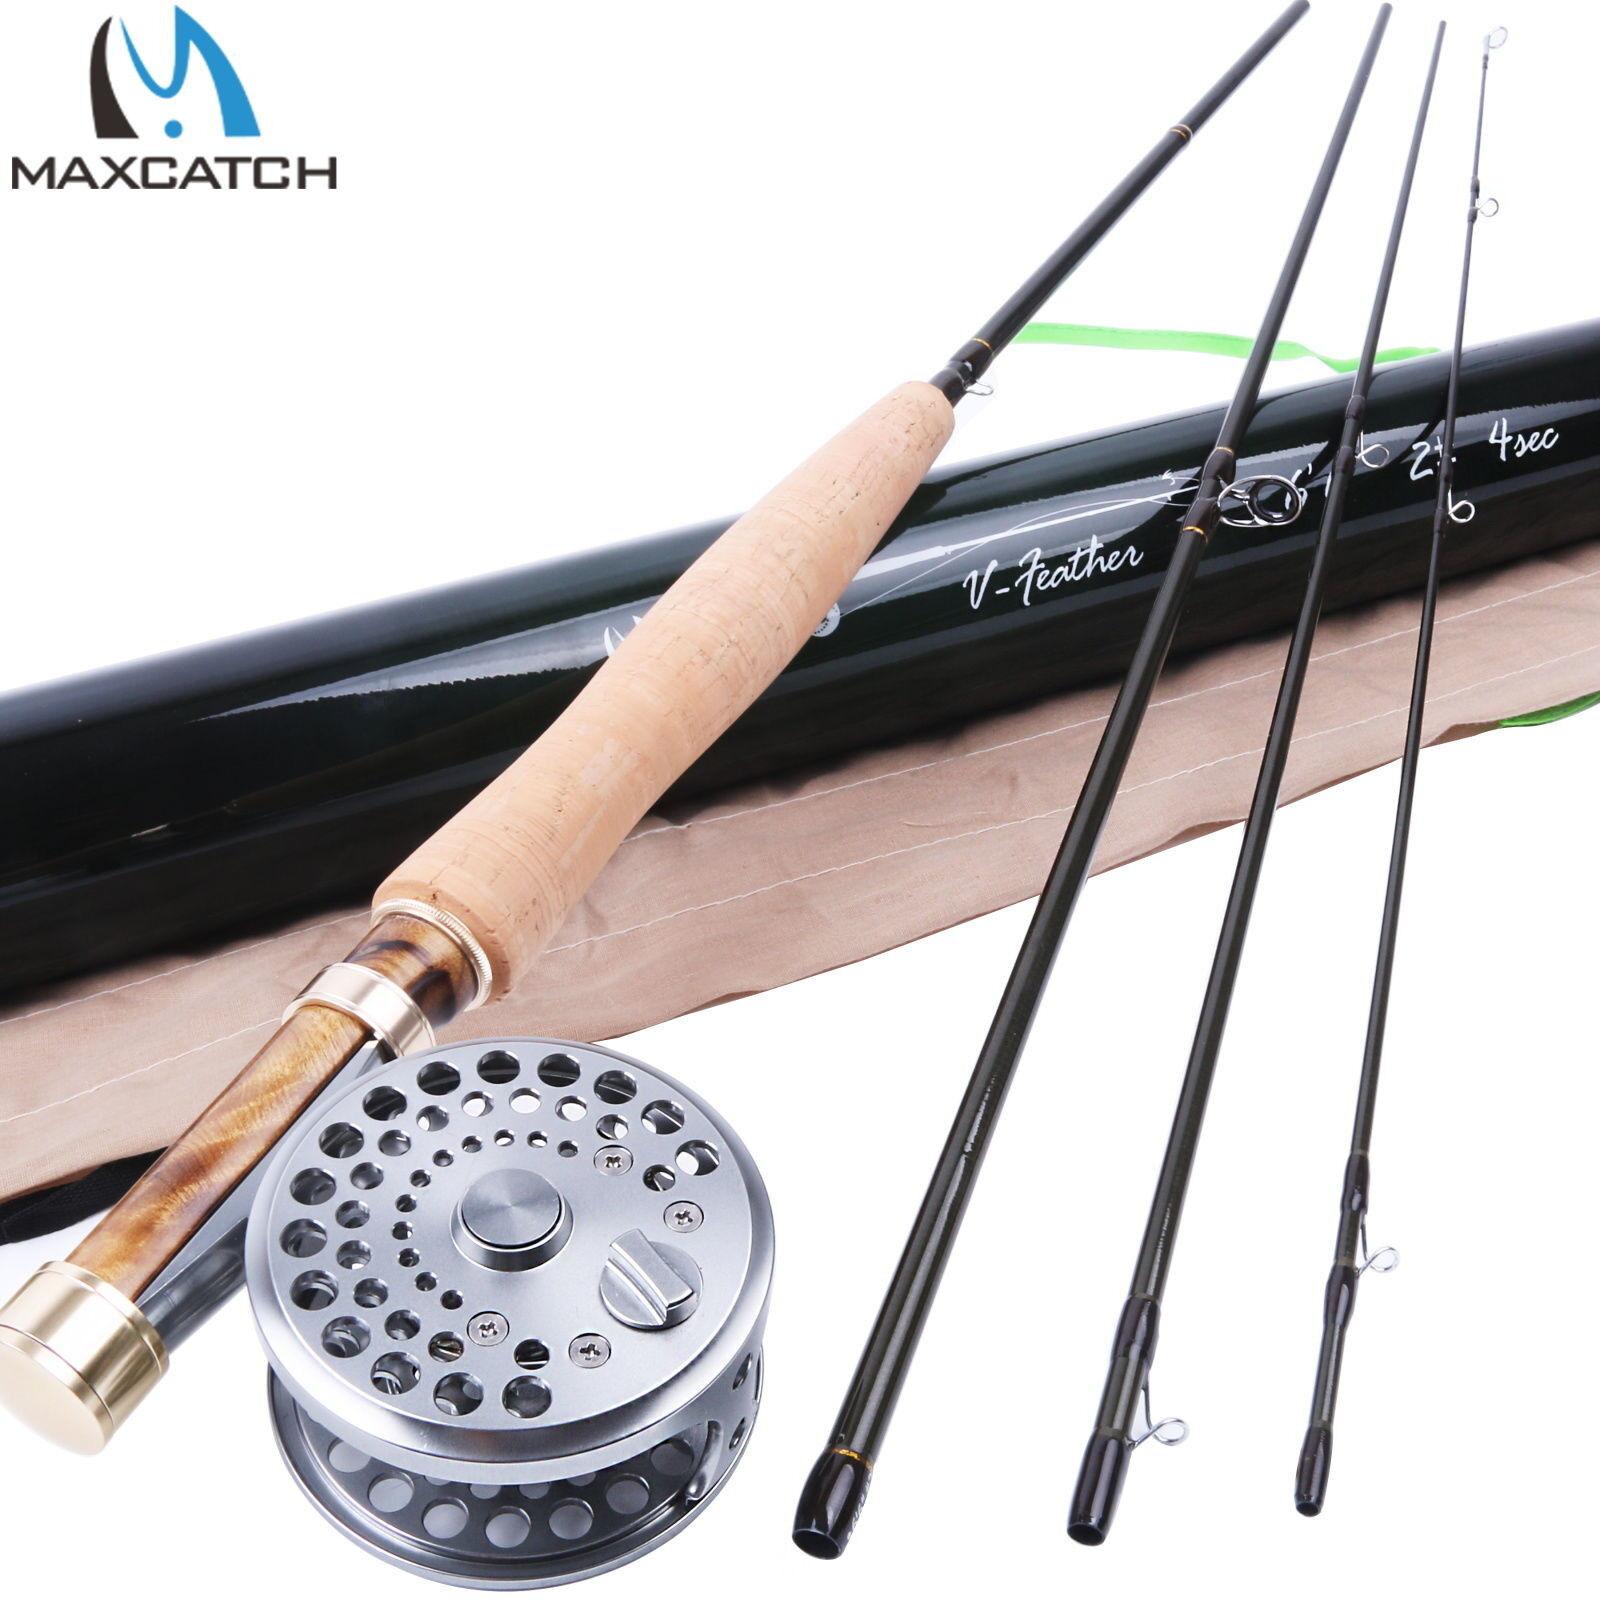 2WT Fly Rod and Reel Combo 6'6 MediumFast Fly Fishing Rod & Classic Fly Reel